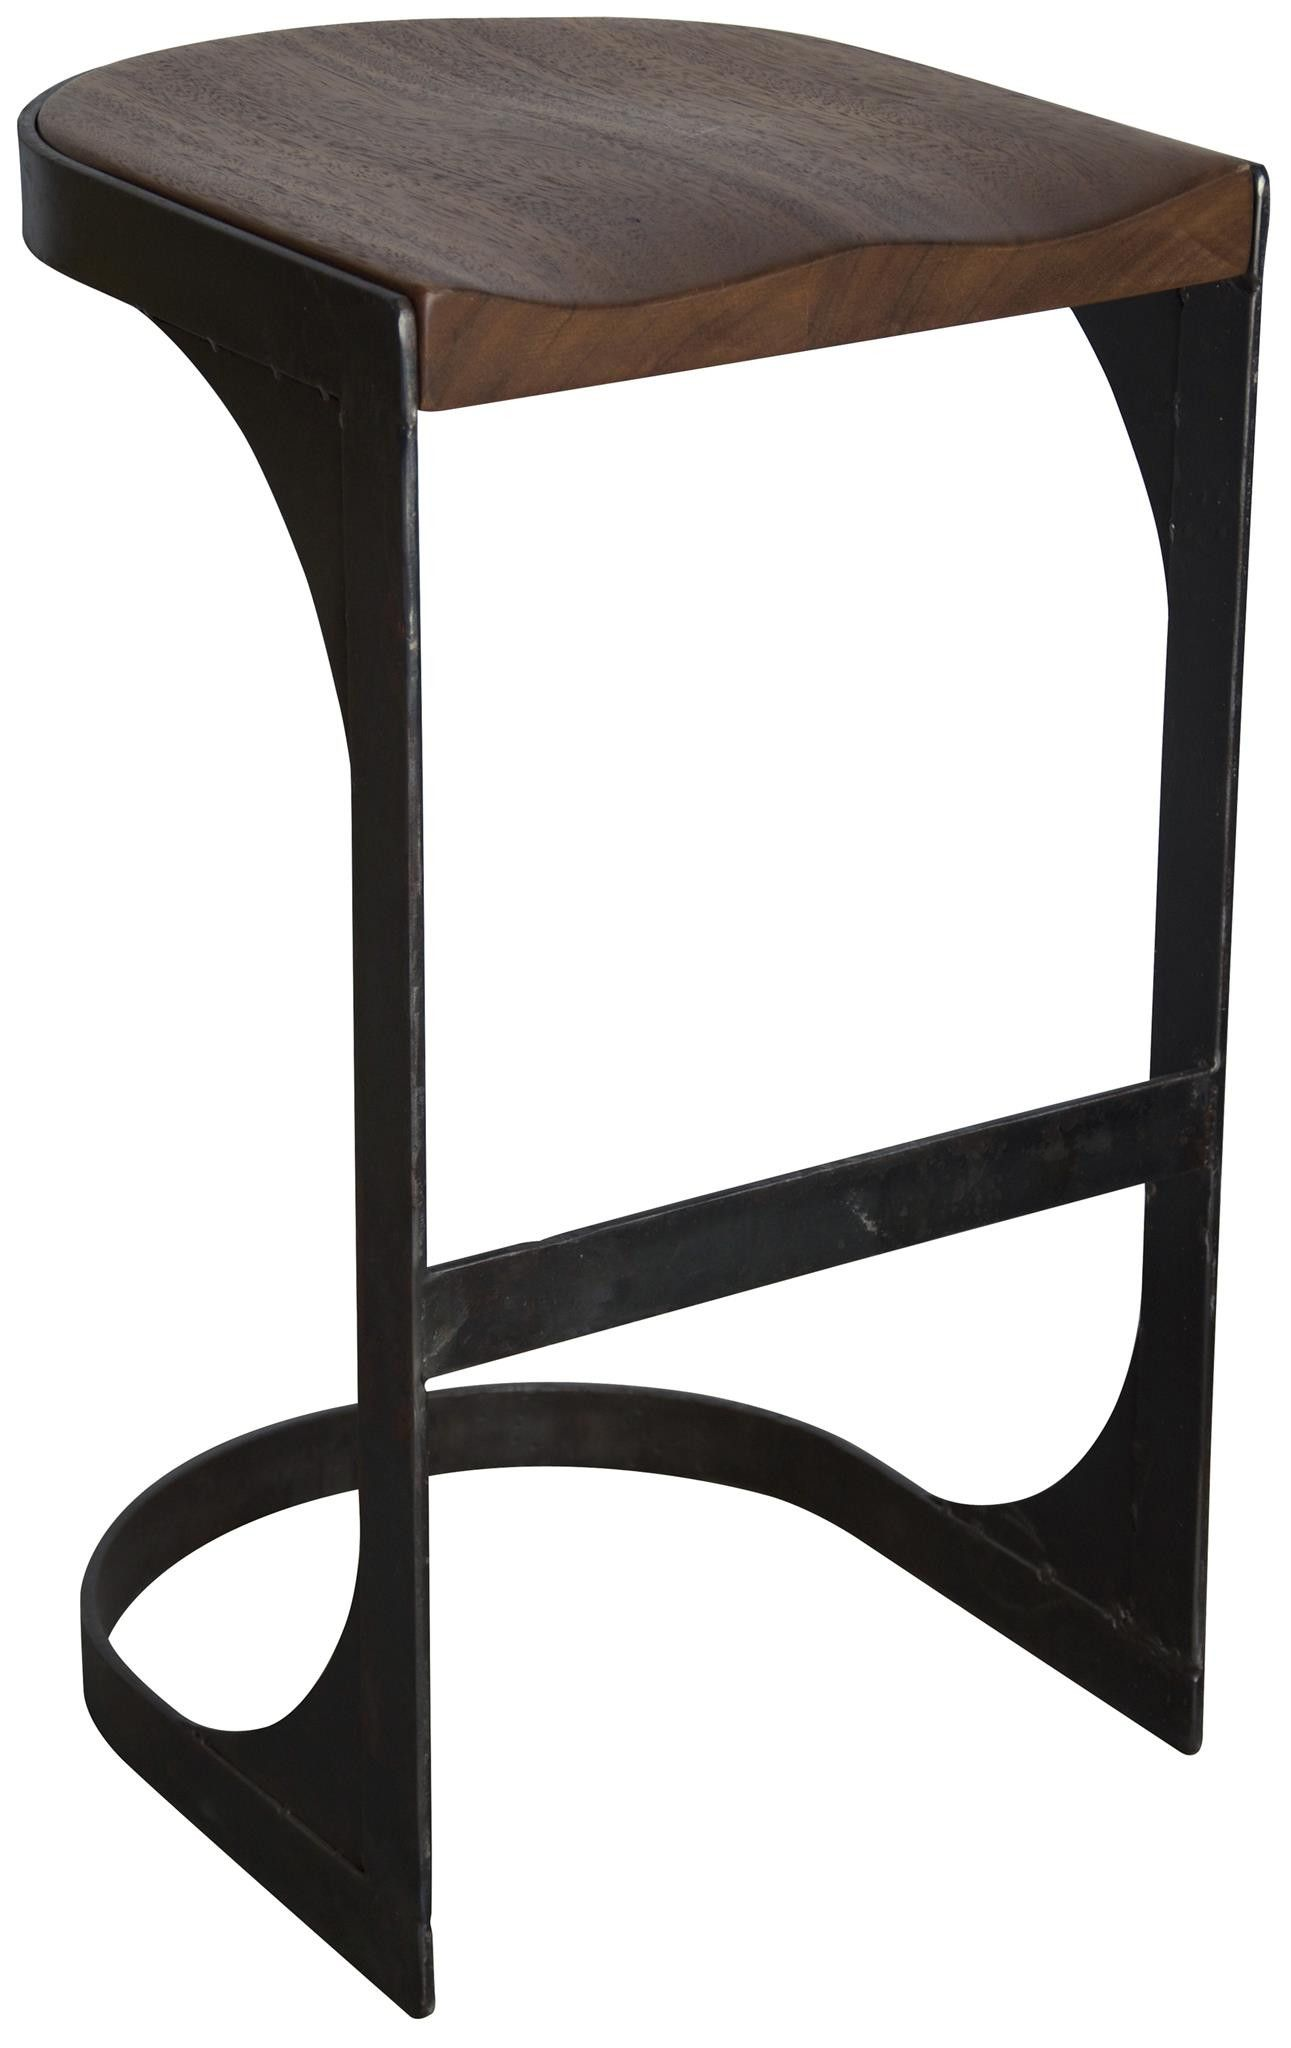 Baxter Bar Counter Stool Floating Chair Stools And Bar